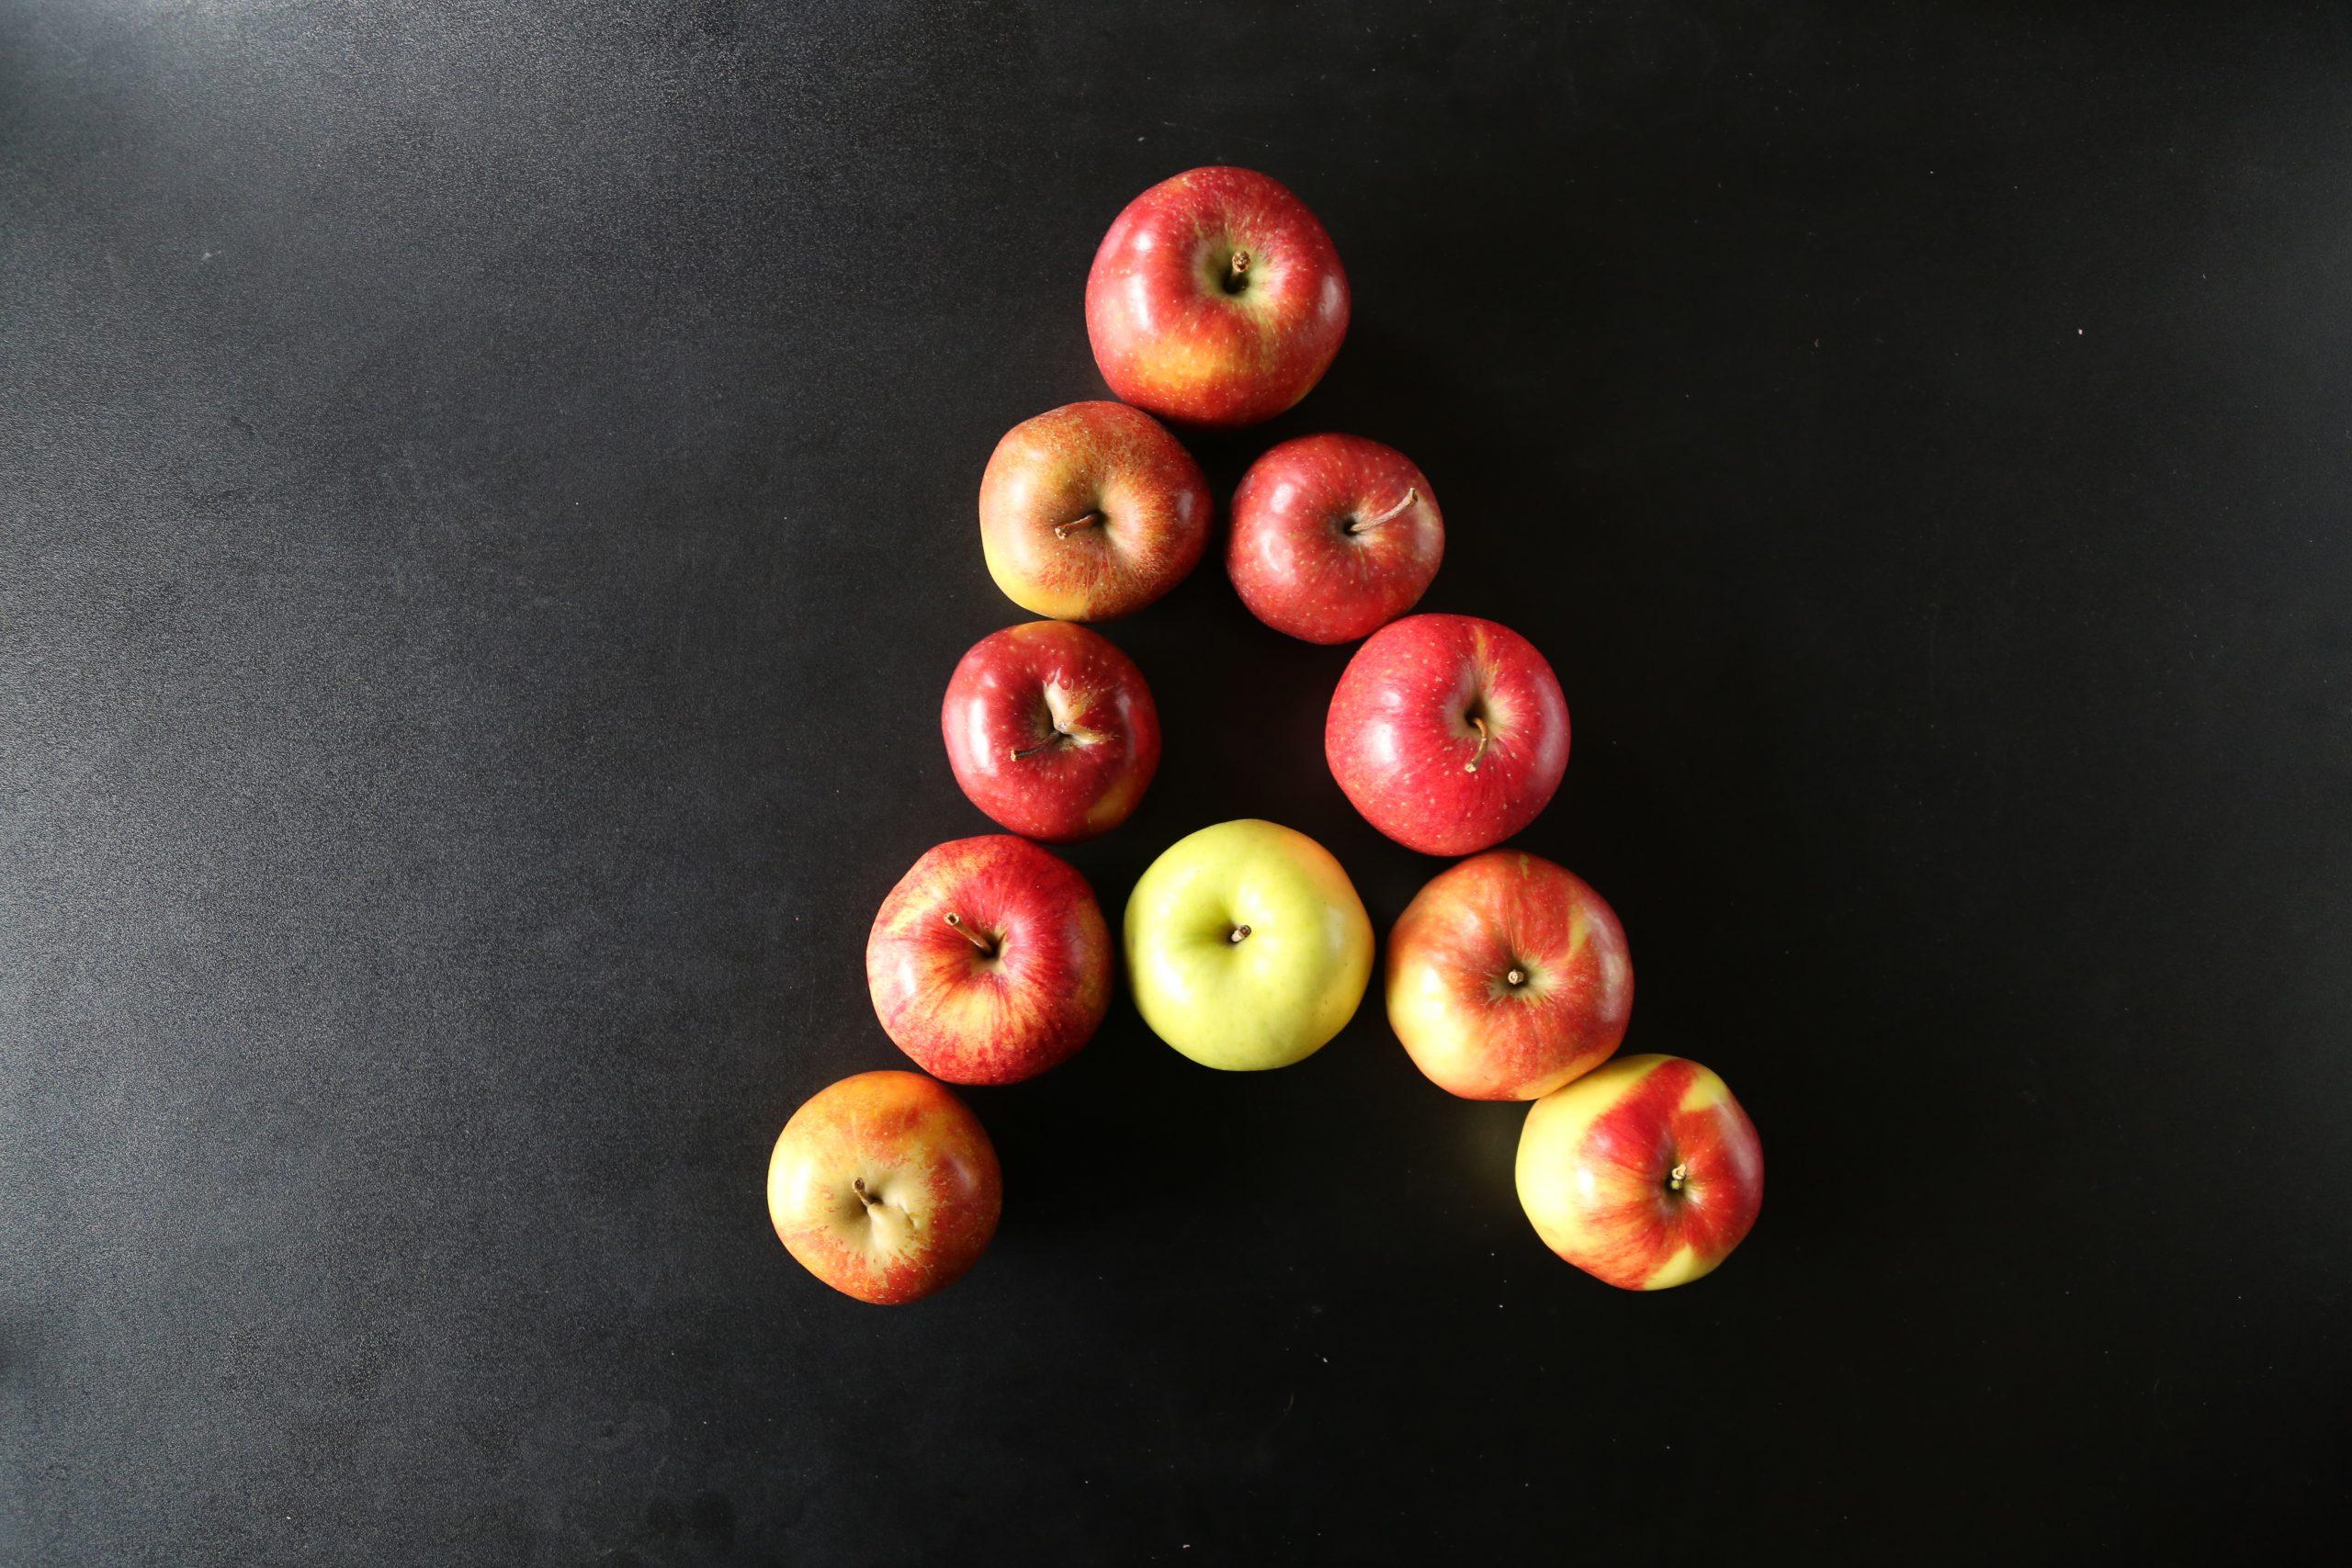 A wie Apfel